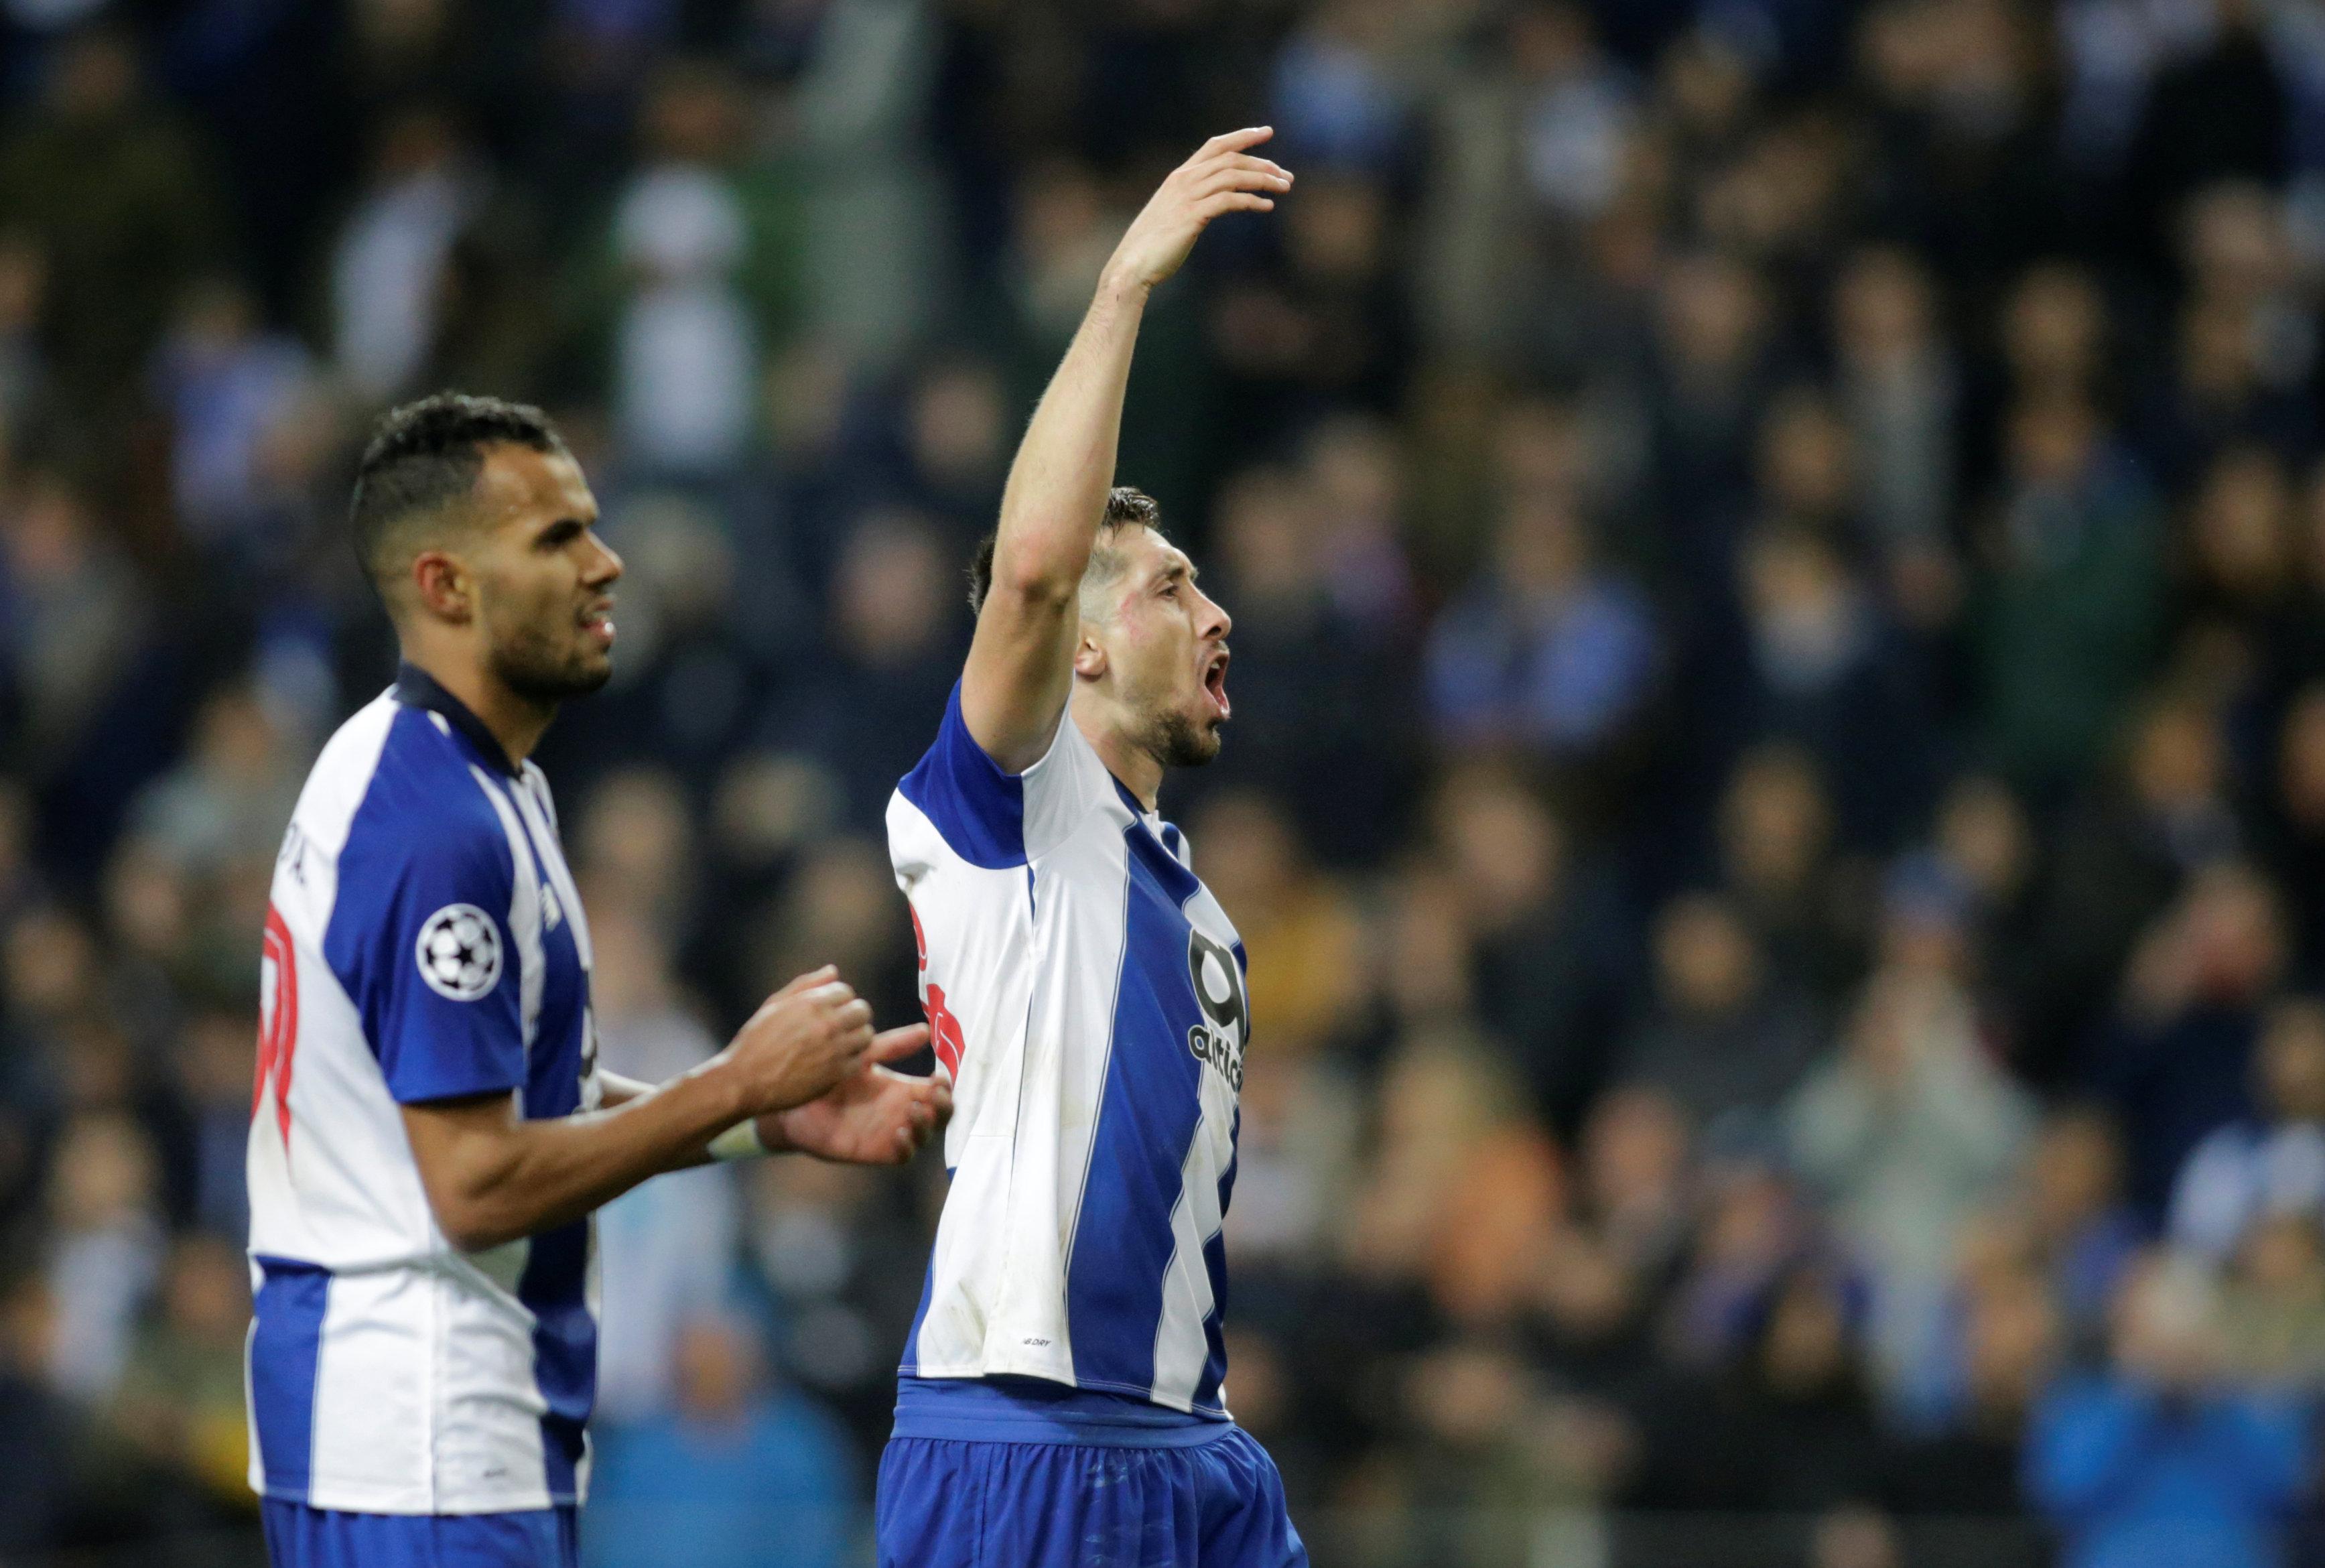 Caras tras un duelo épico: la euforia de Porto y la tristeza de Roma en la Champions